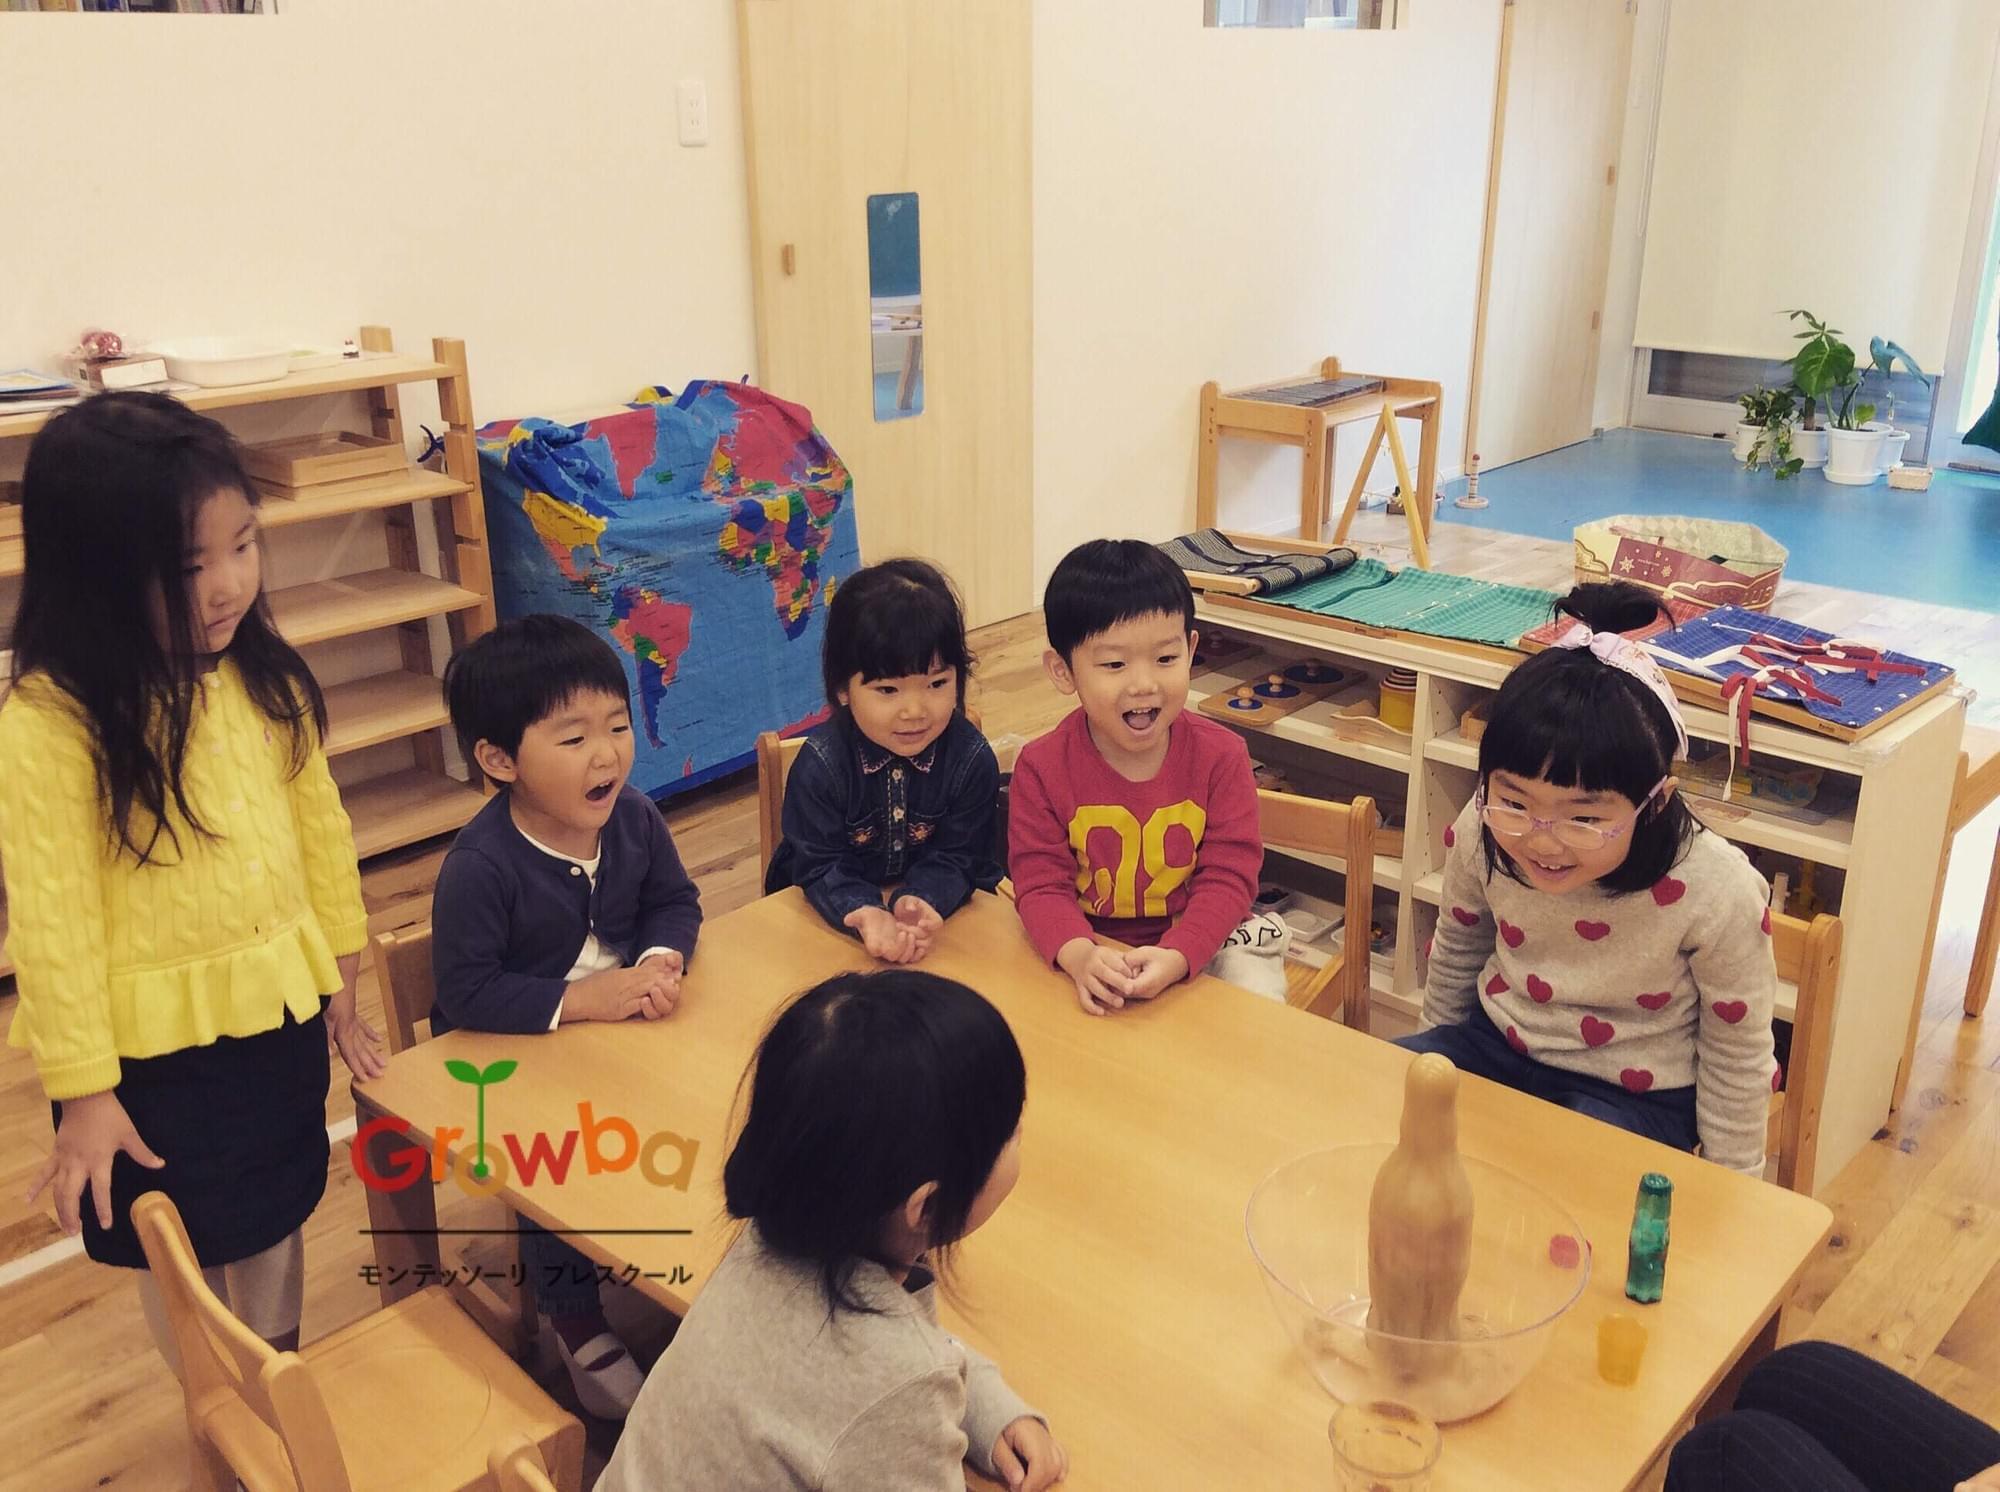 Growba® 3-6歳クラス体験(滝ノ水本校)